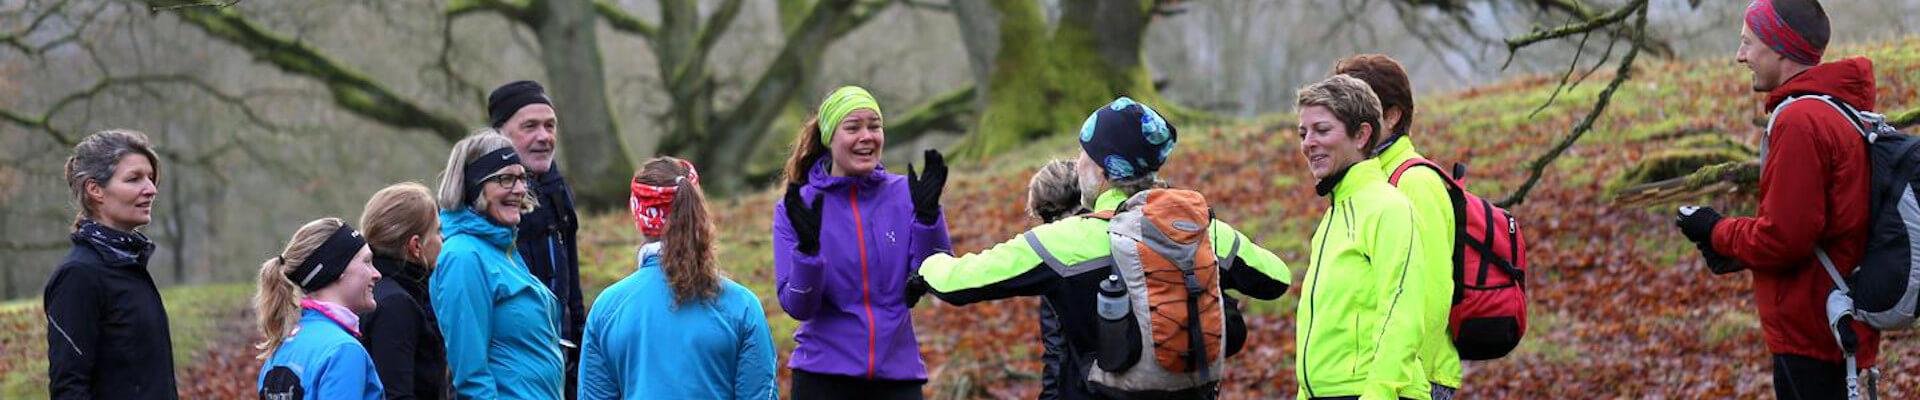 Naturforsamlingshus - løb og mindfullness top